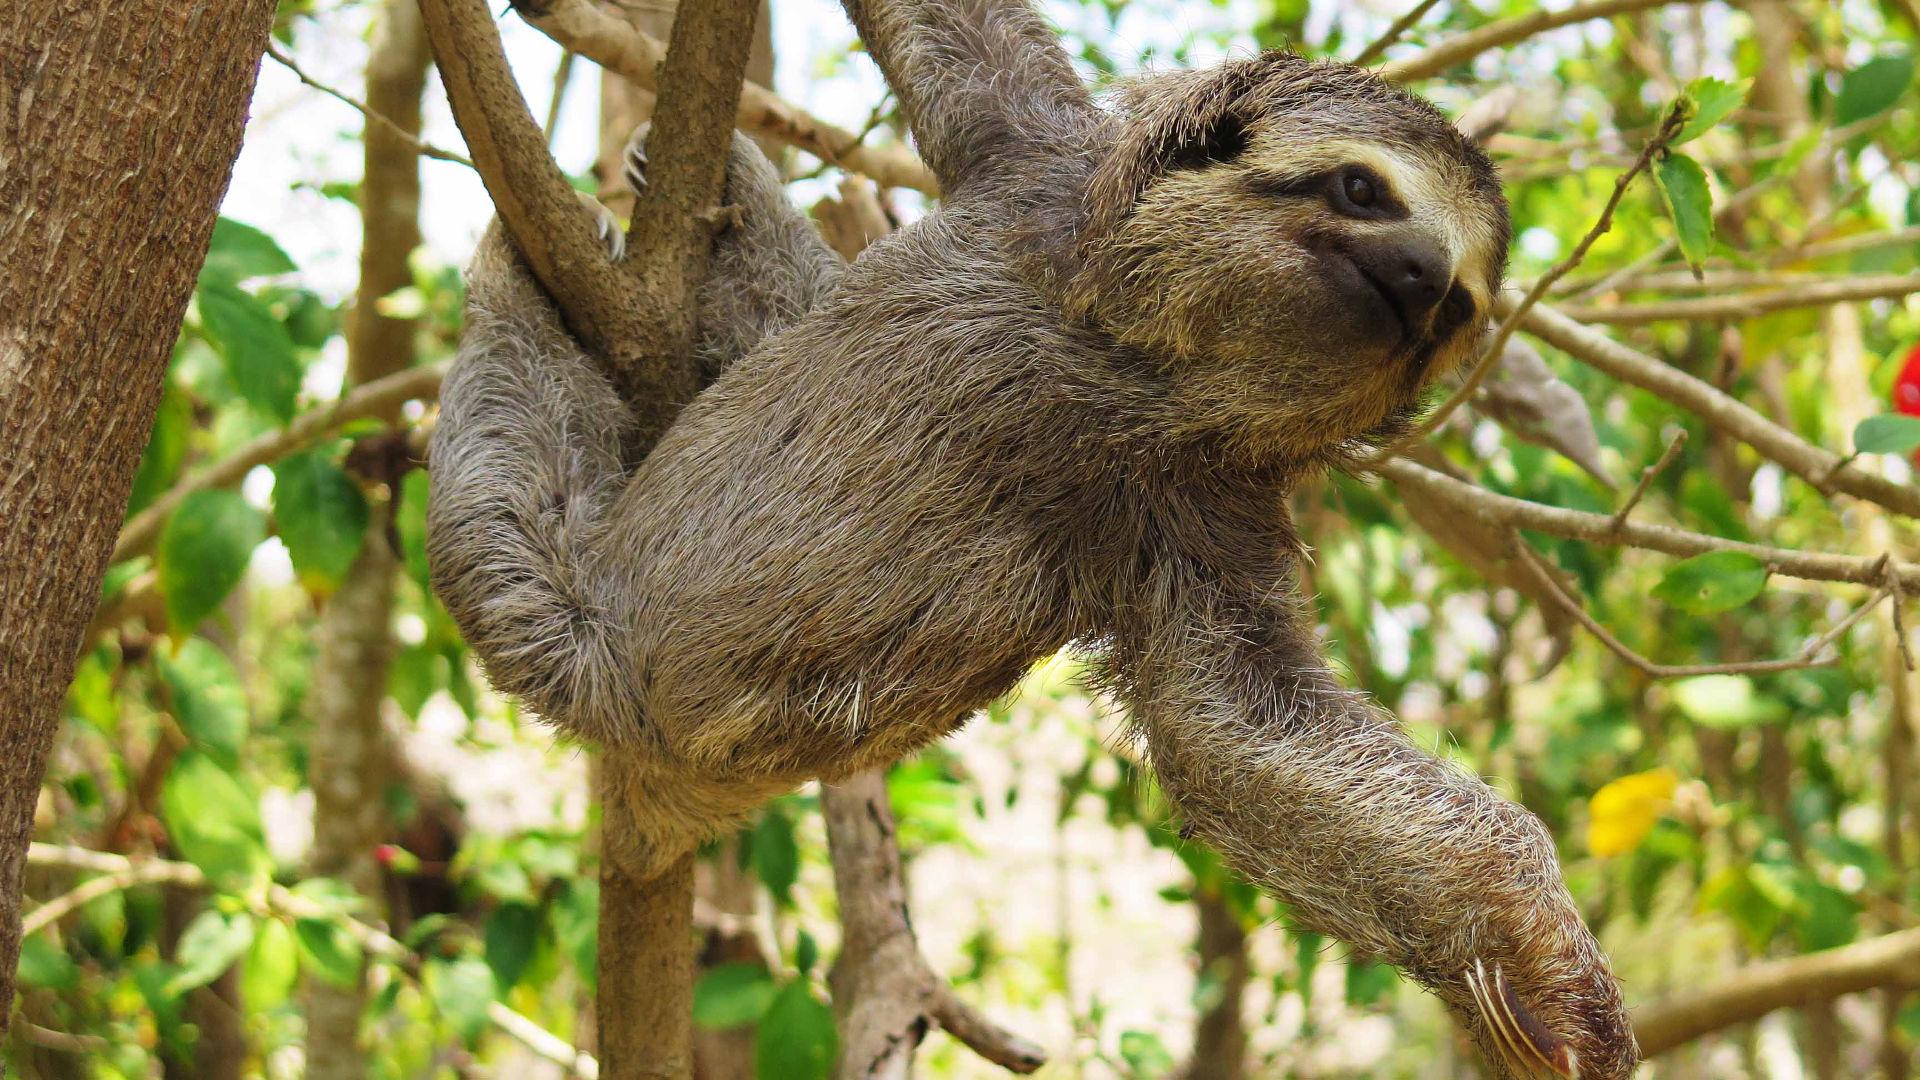 Sloth in Braulio Carillo National Park